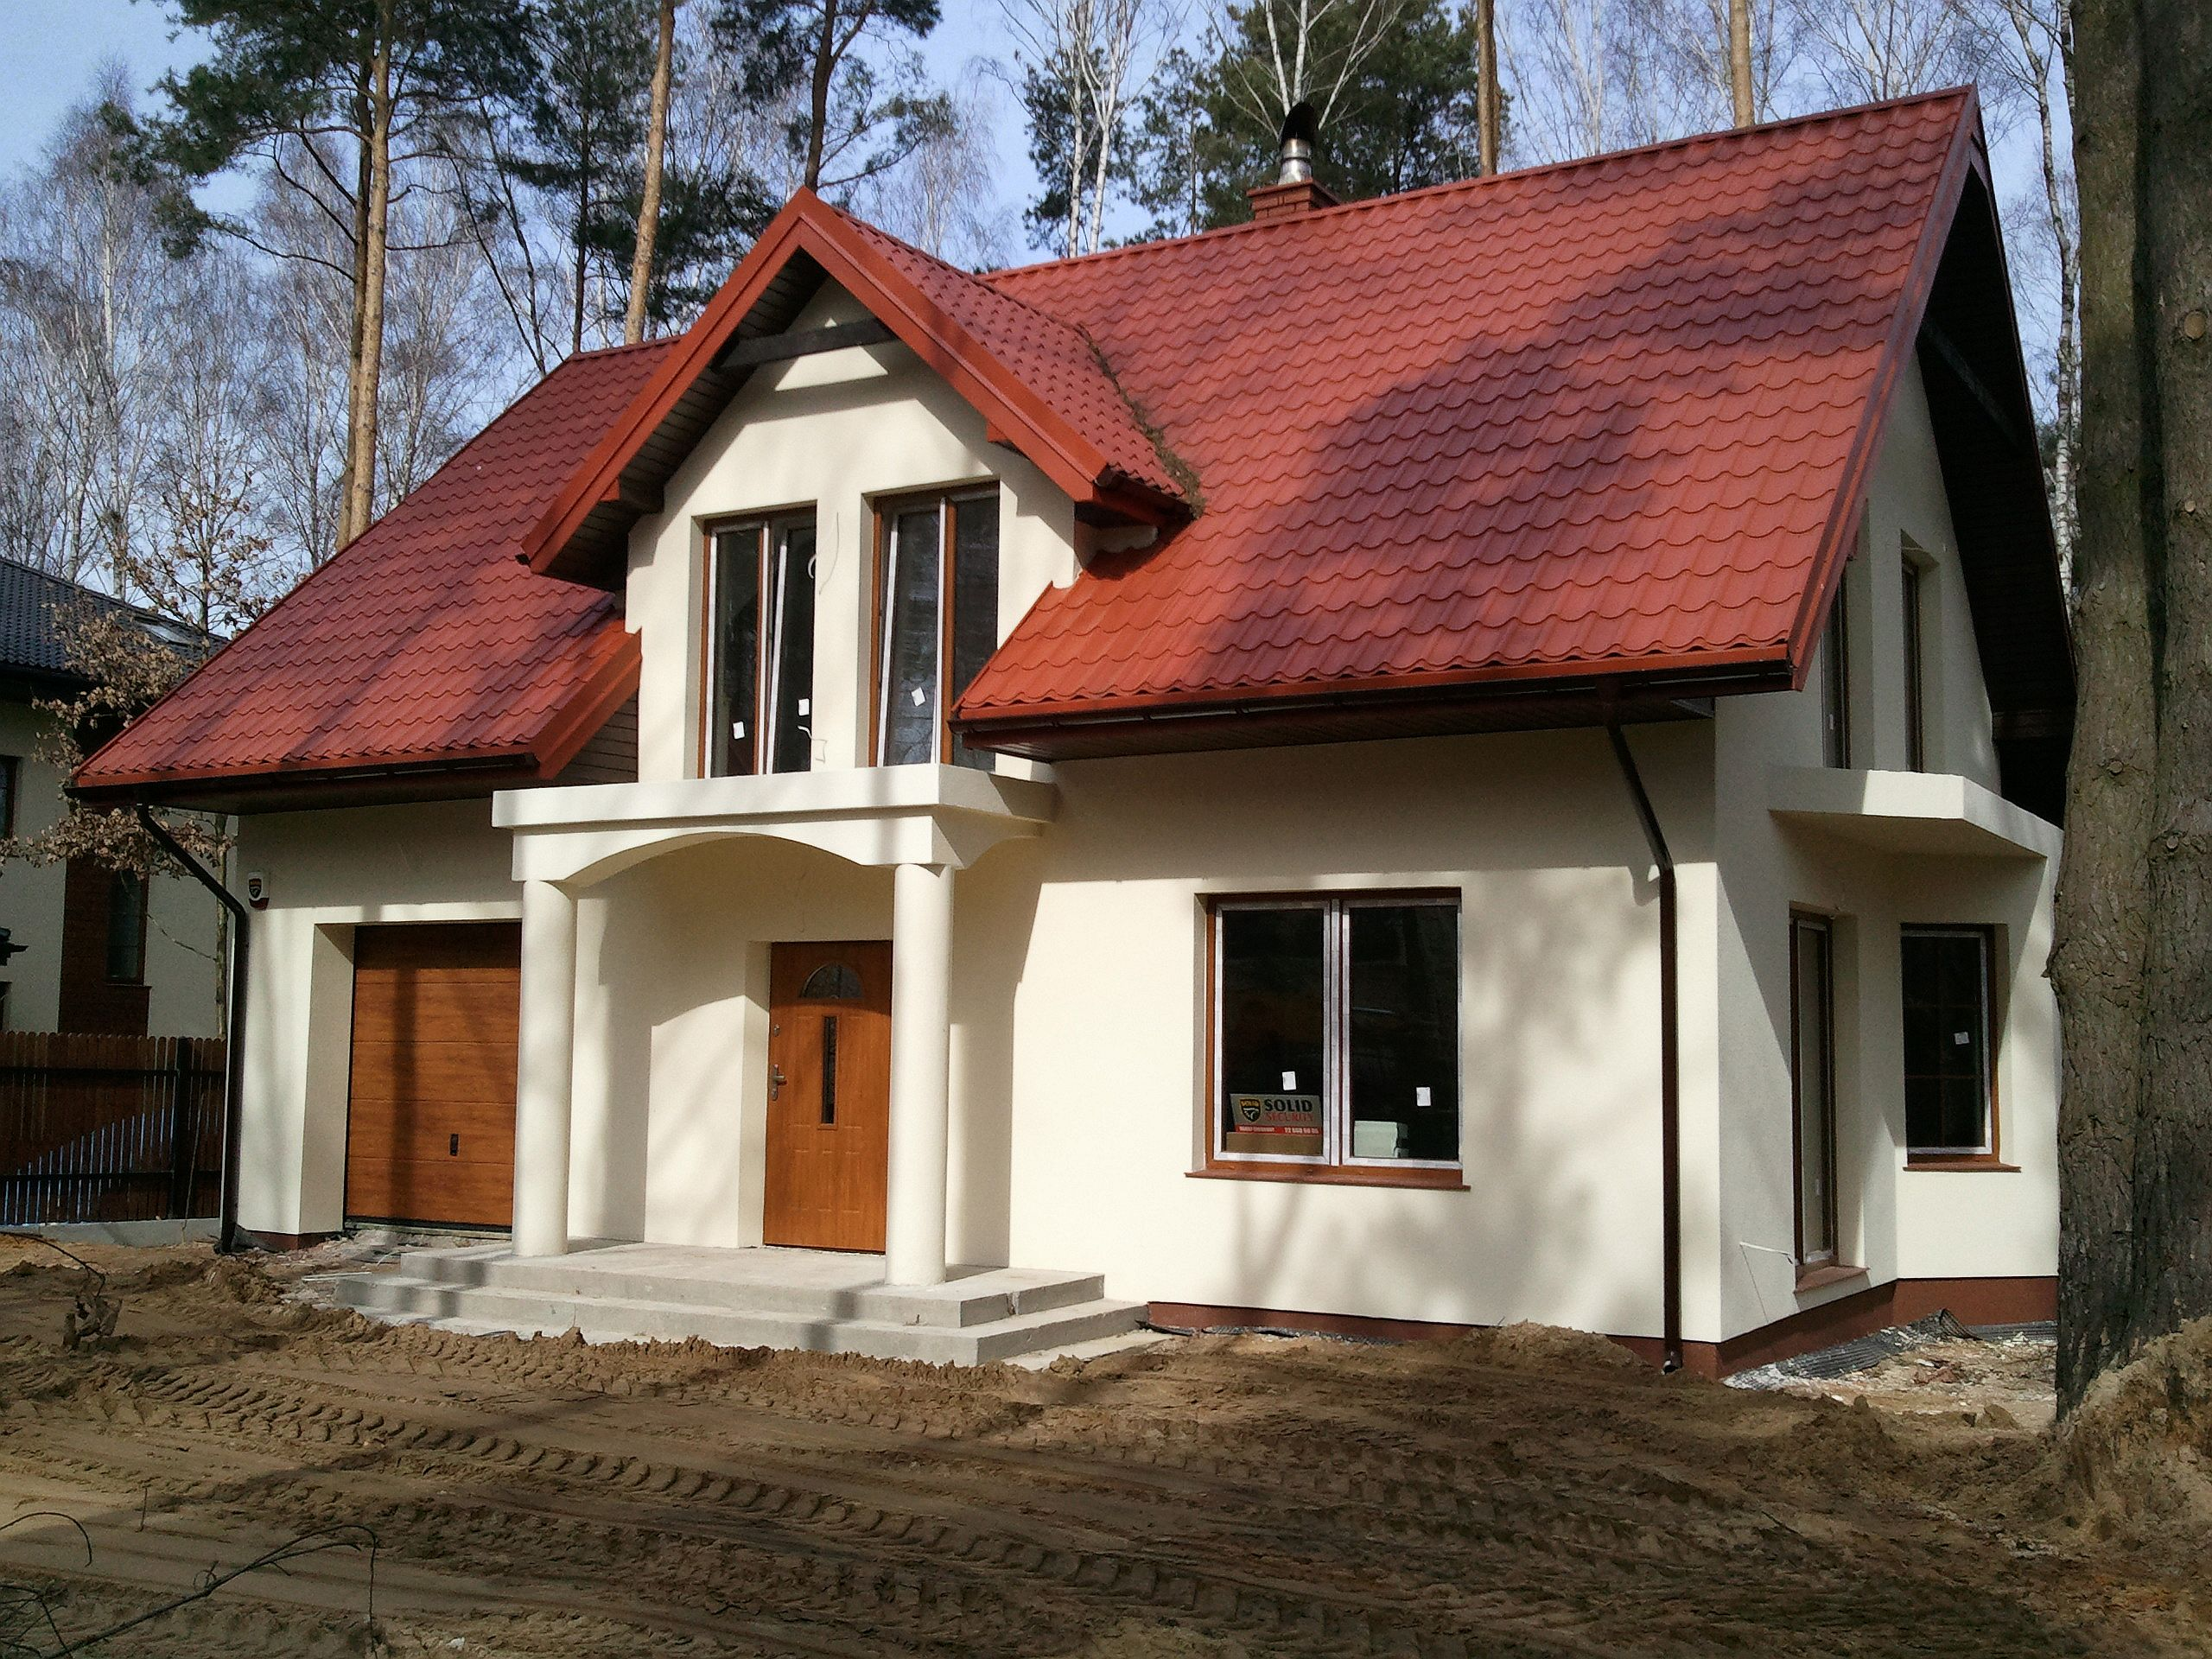 Piaseczno budowa domu cdevelopment stan deweloperski